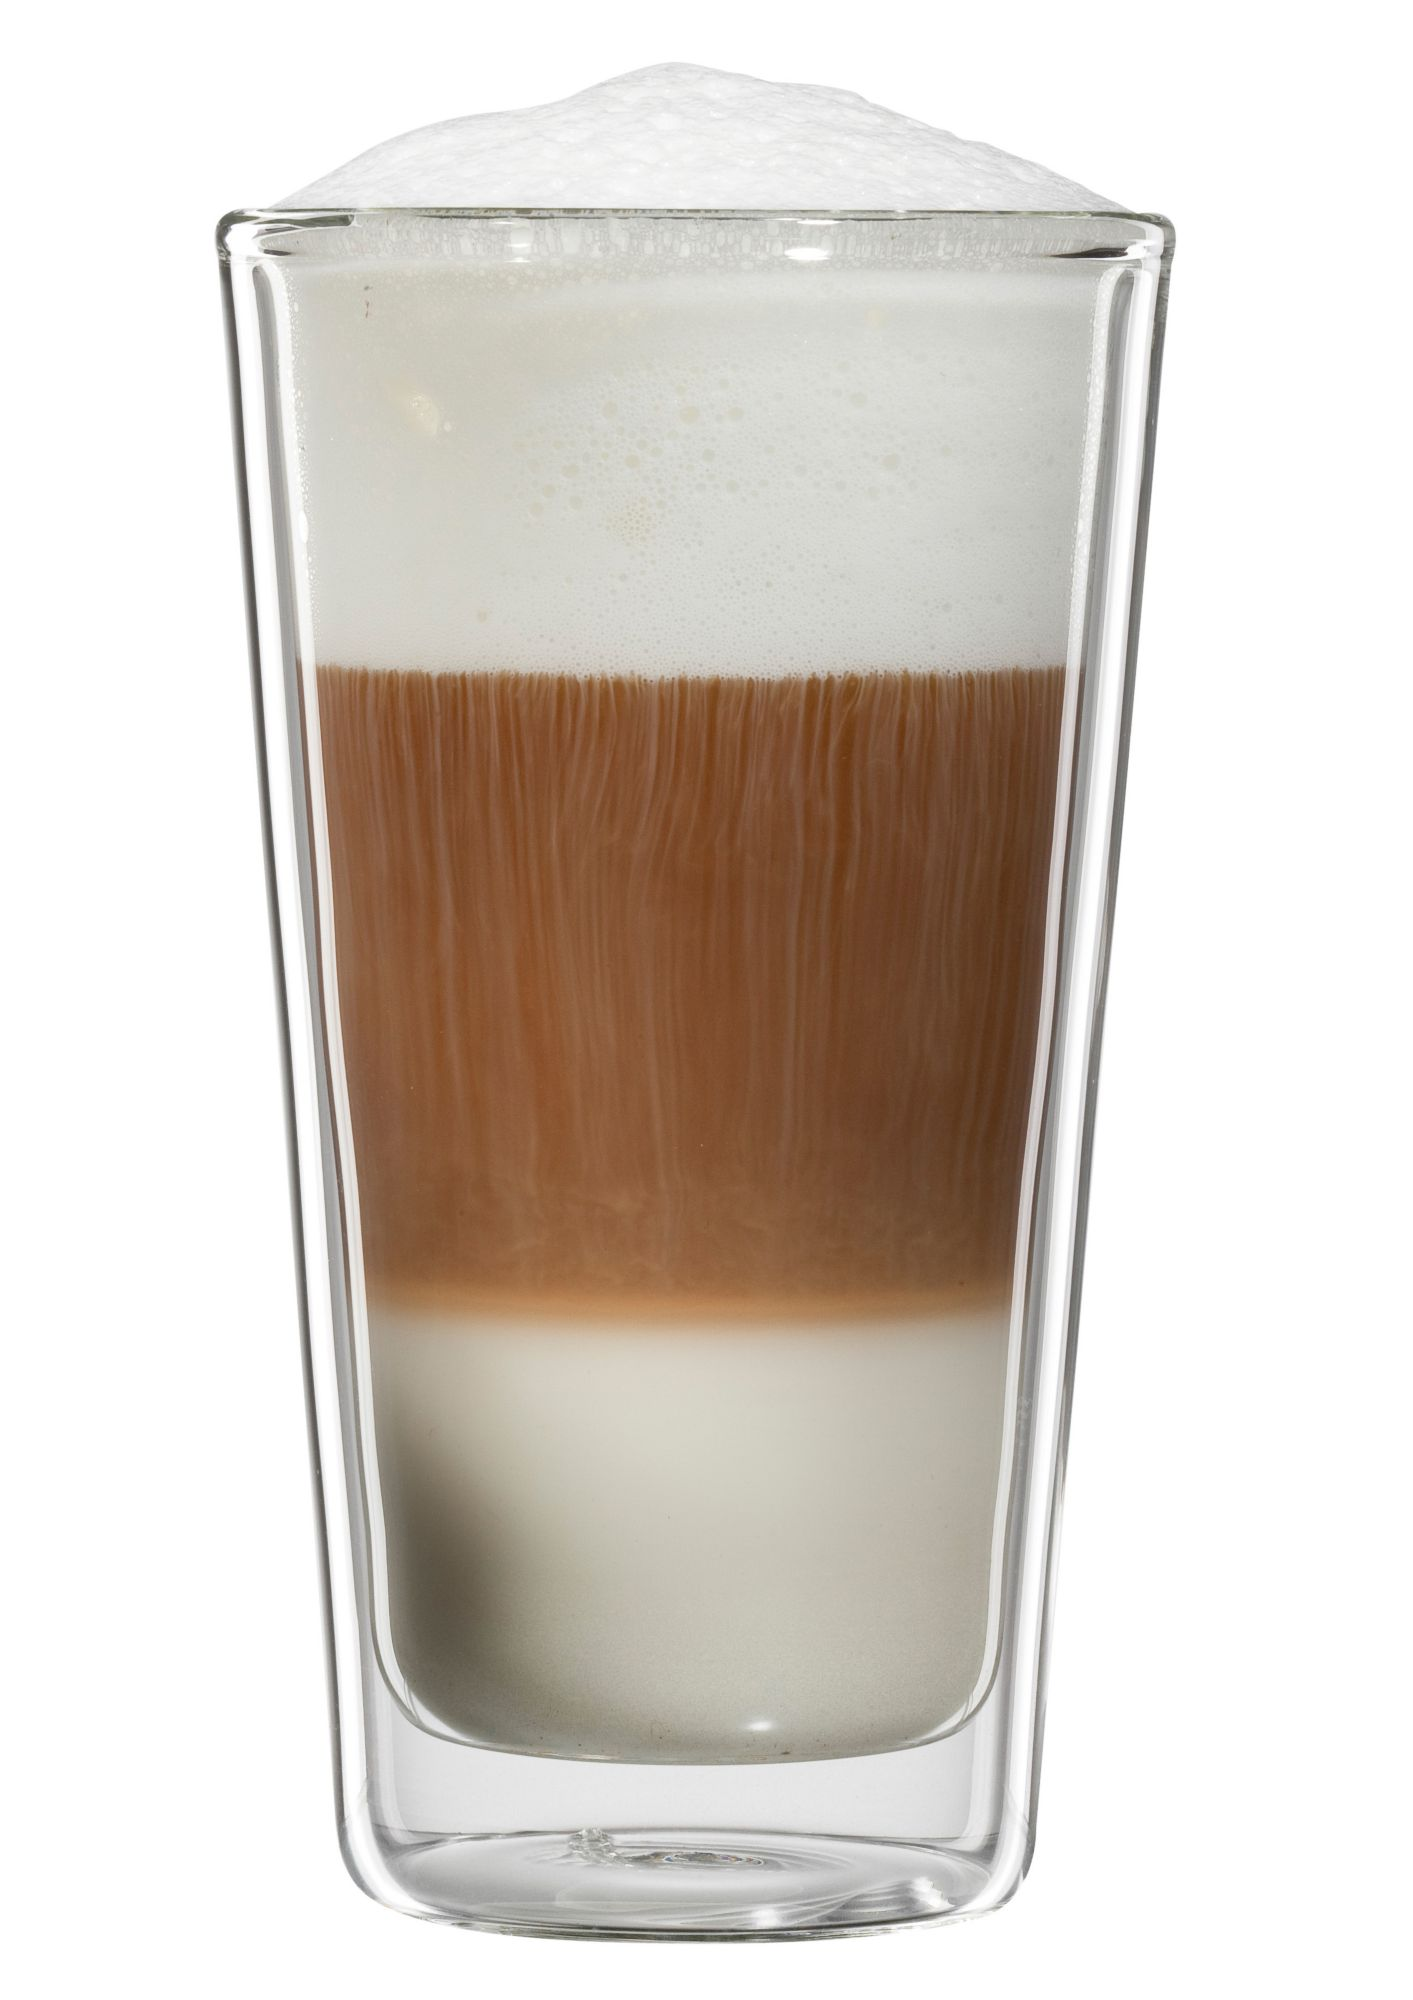 BLOOMIX bloomix Latte Macchiato-Glas, 4er Set , »Milano«, 300 ml